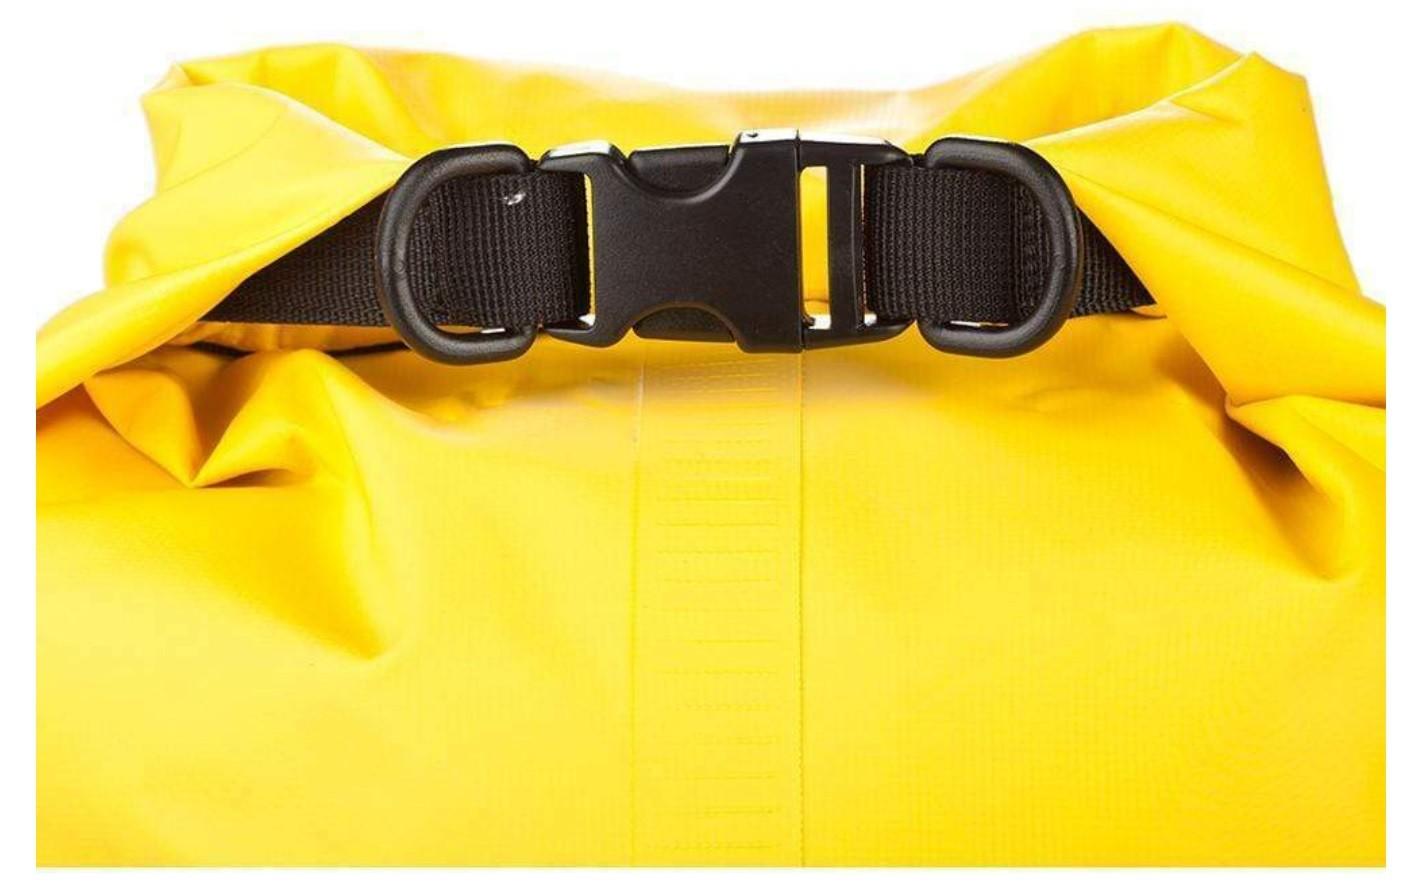 Bolsa Saco Estanque à Prova D'água 20 Litros em PVC Attwood Amarela p/ Barcos Lanchas Jet